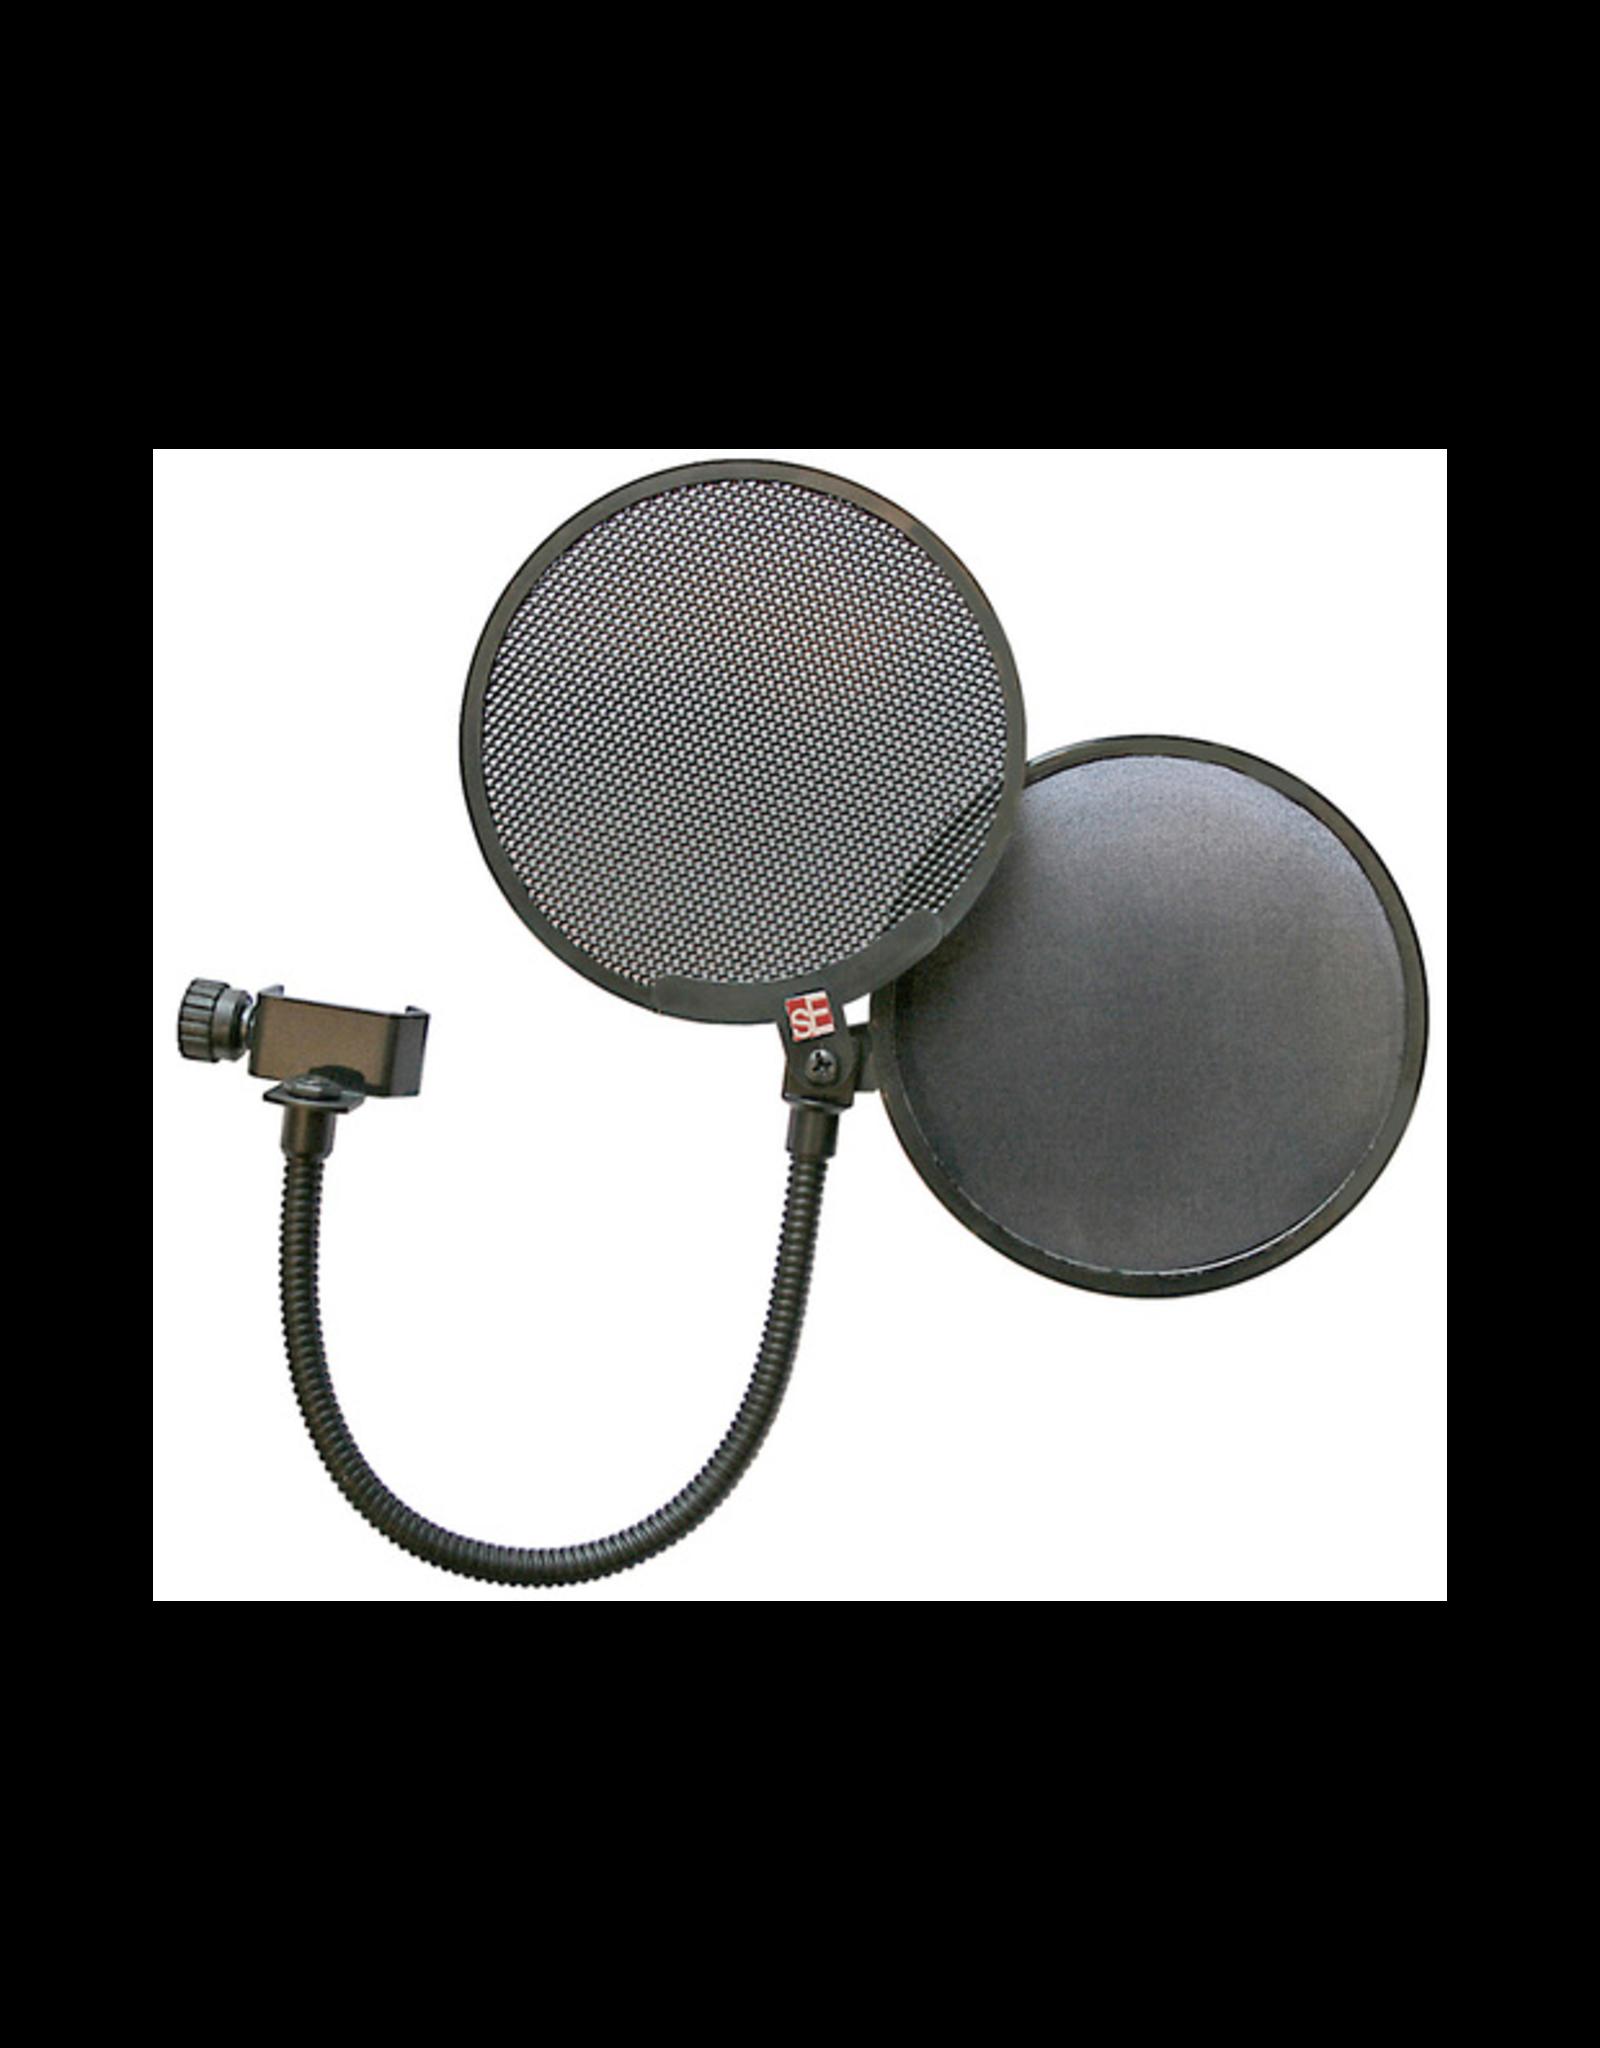 sE Electronics sE Electronics Dual Pop Filter Fabric/Metal